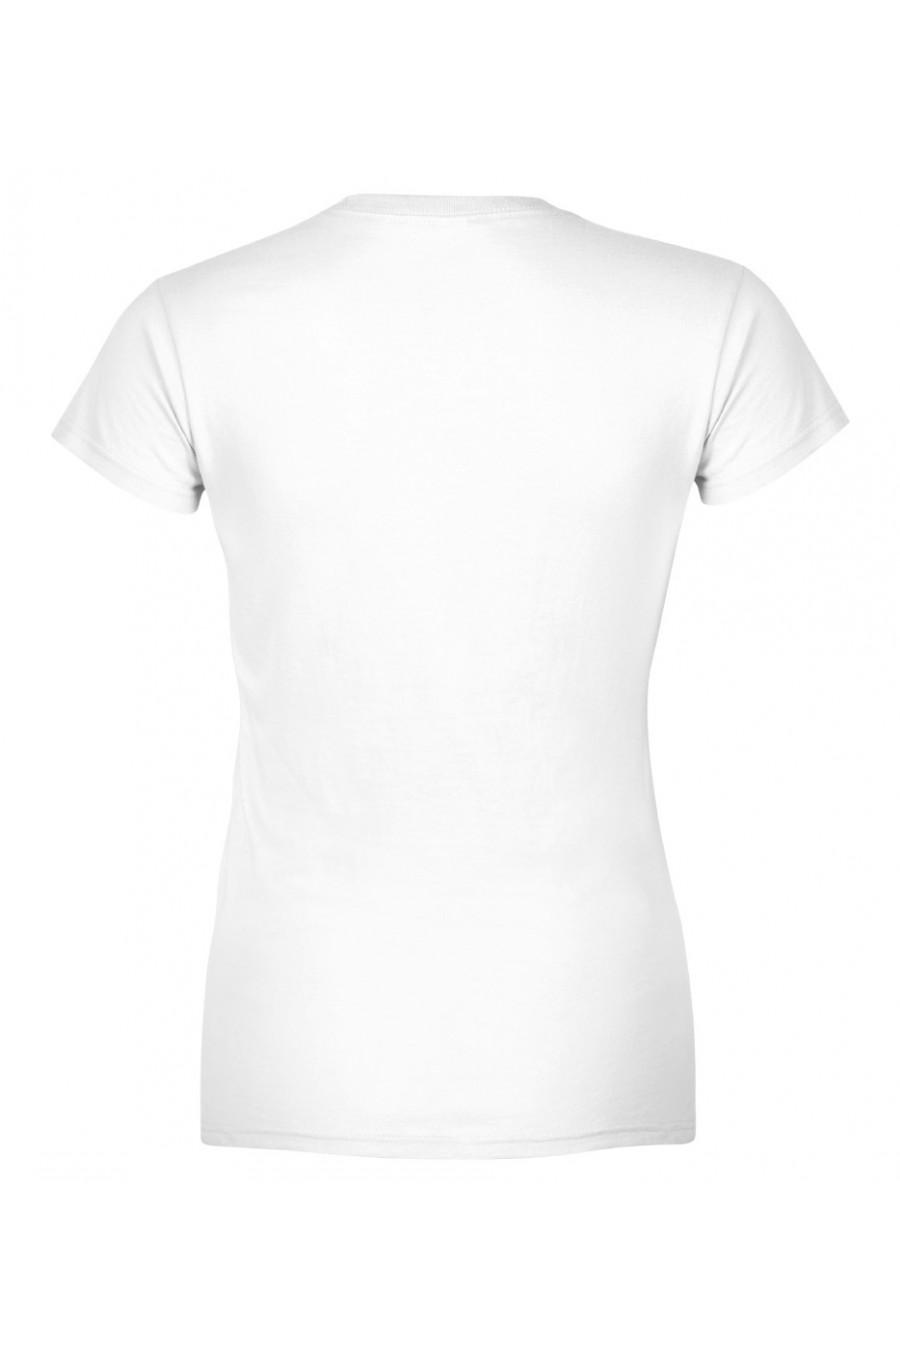 Koszulka Damska Płonąca Choinka